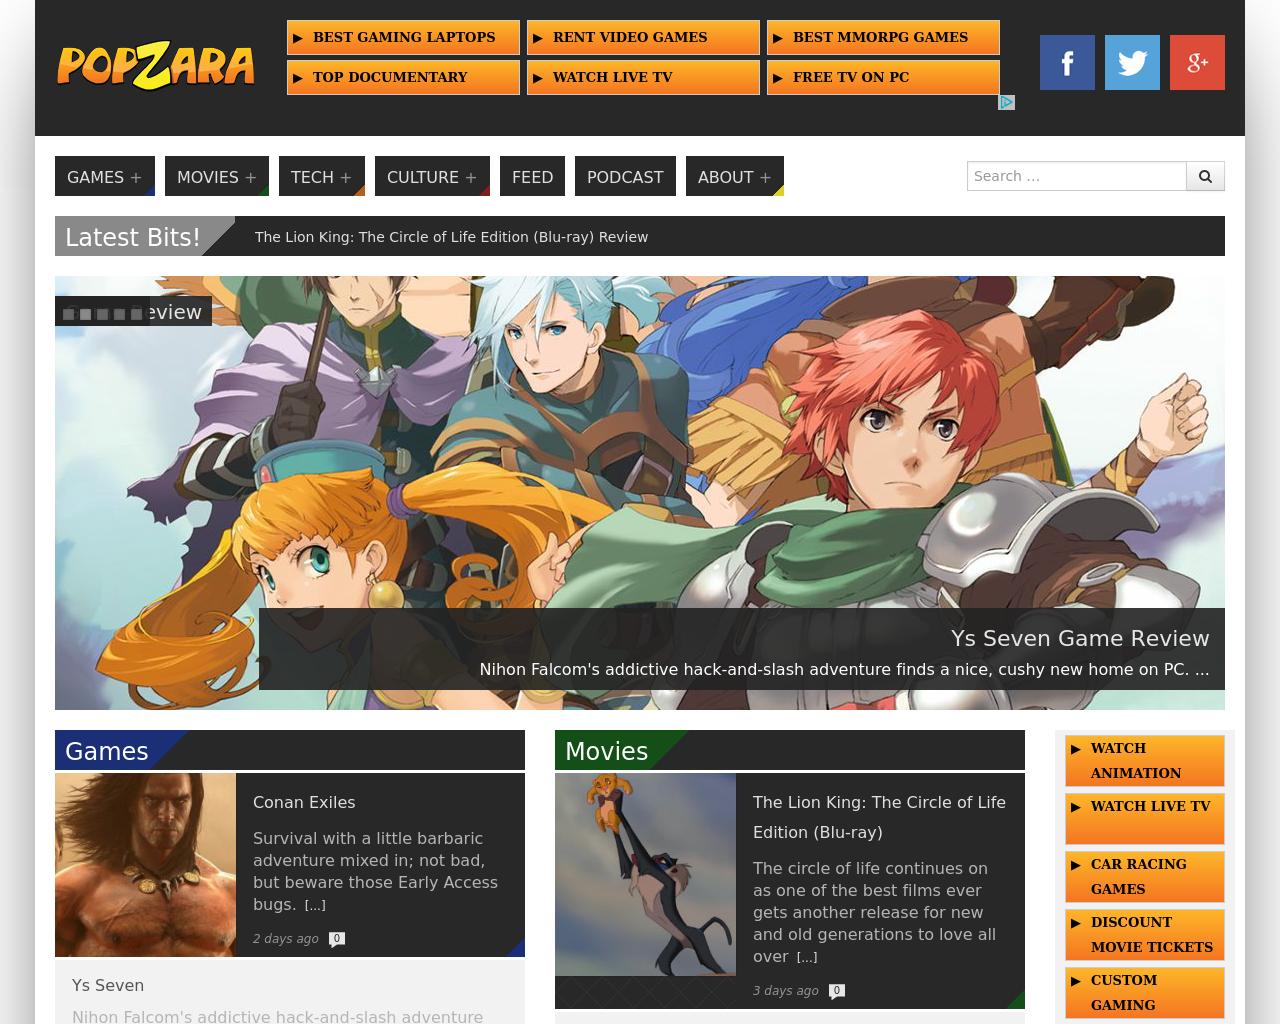 POPZARA-Advertising-Reviews-Pricing